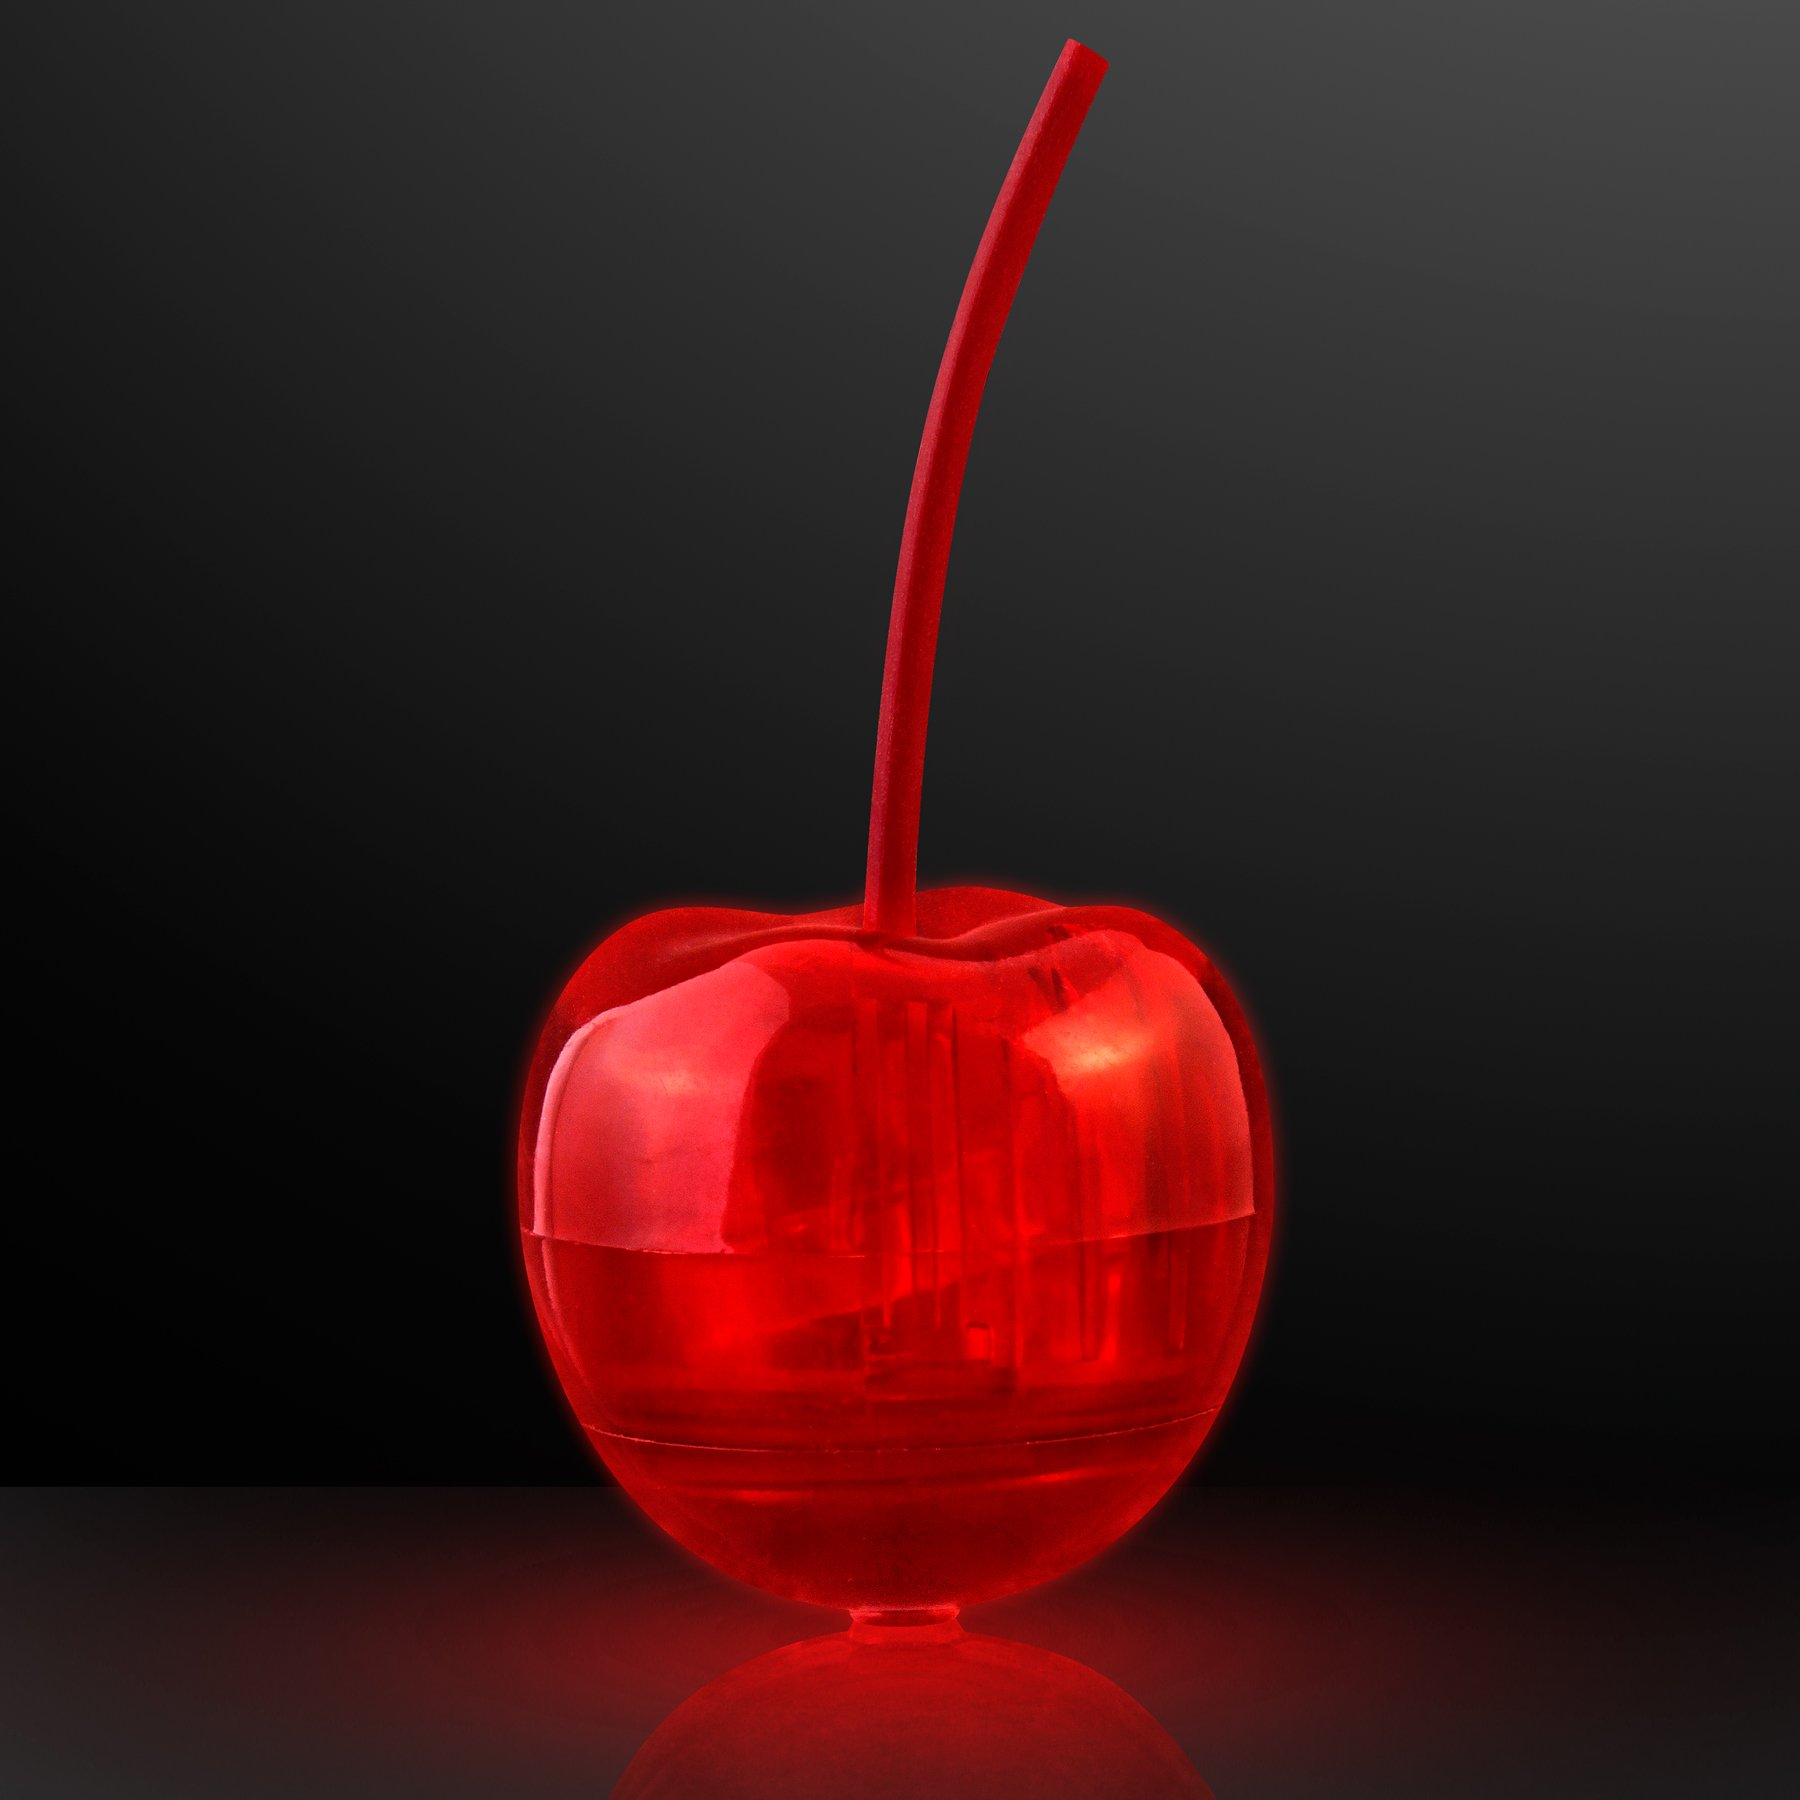 Light Up LED Cherry Drink Garnish (Set of 24) by FlashingBlinkyLights